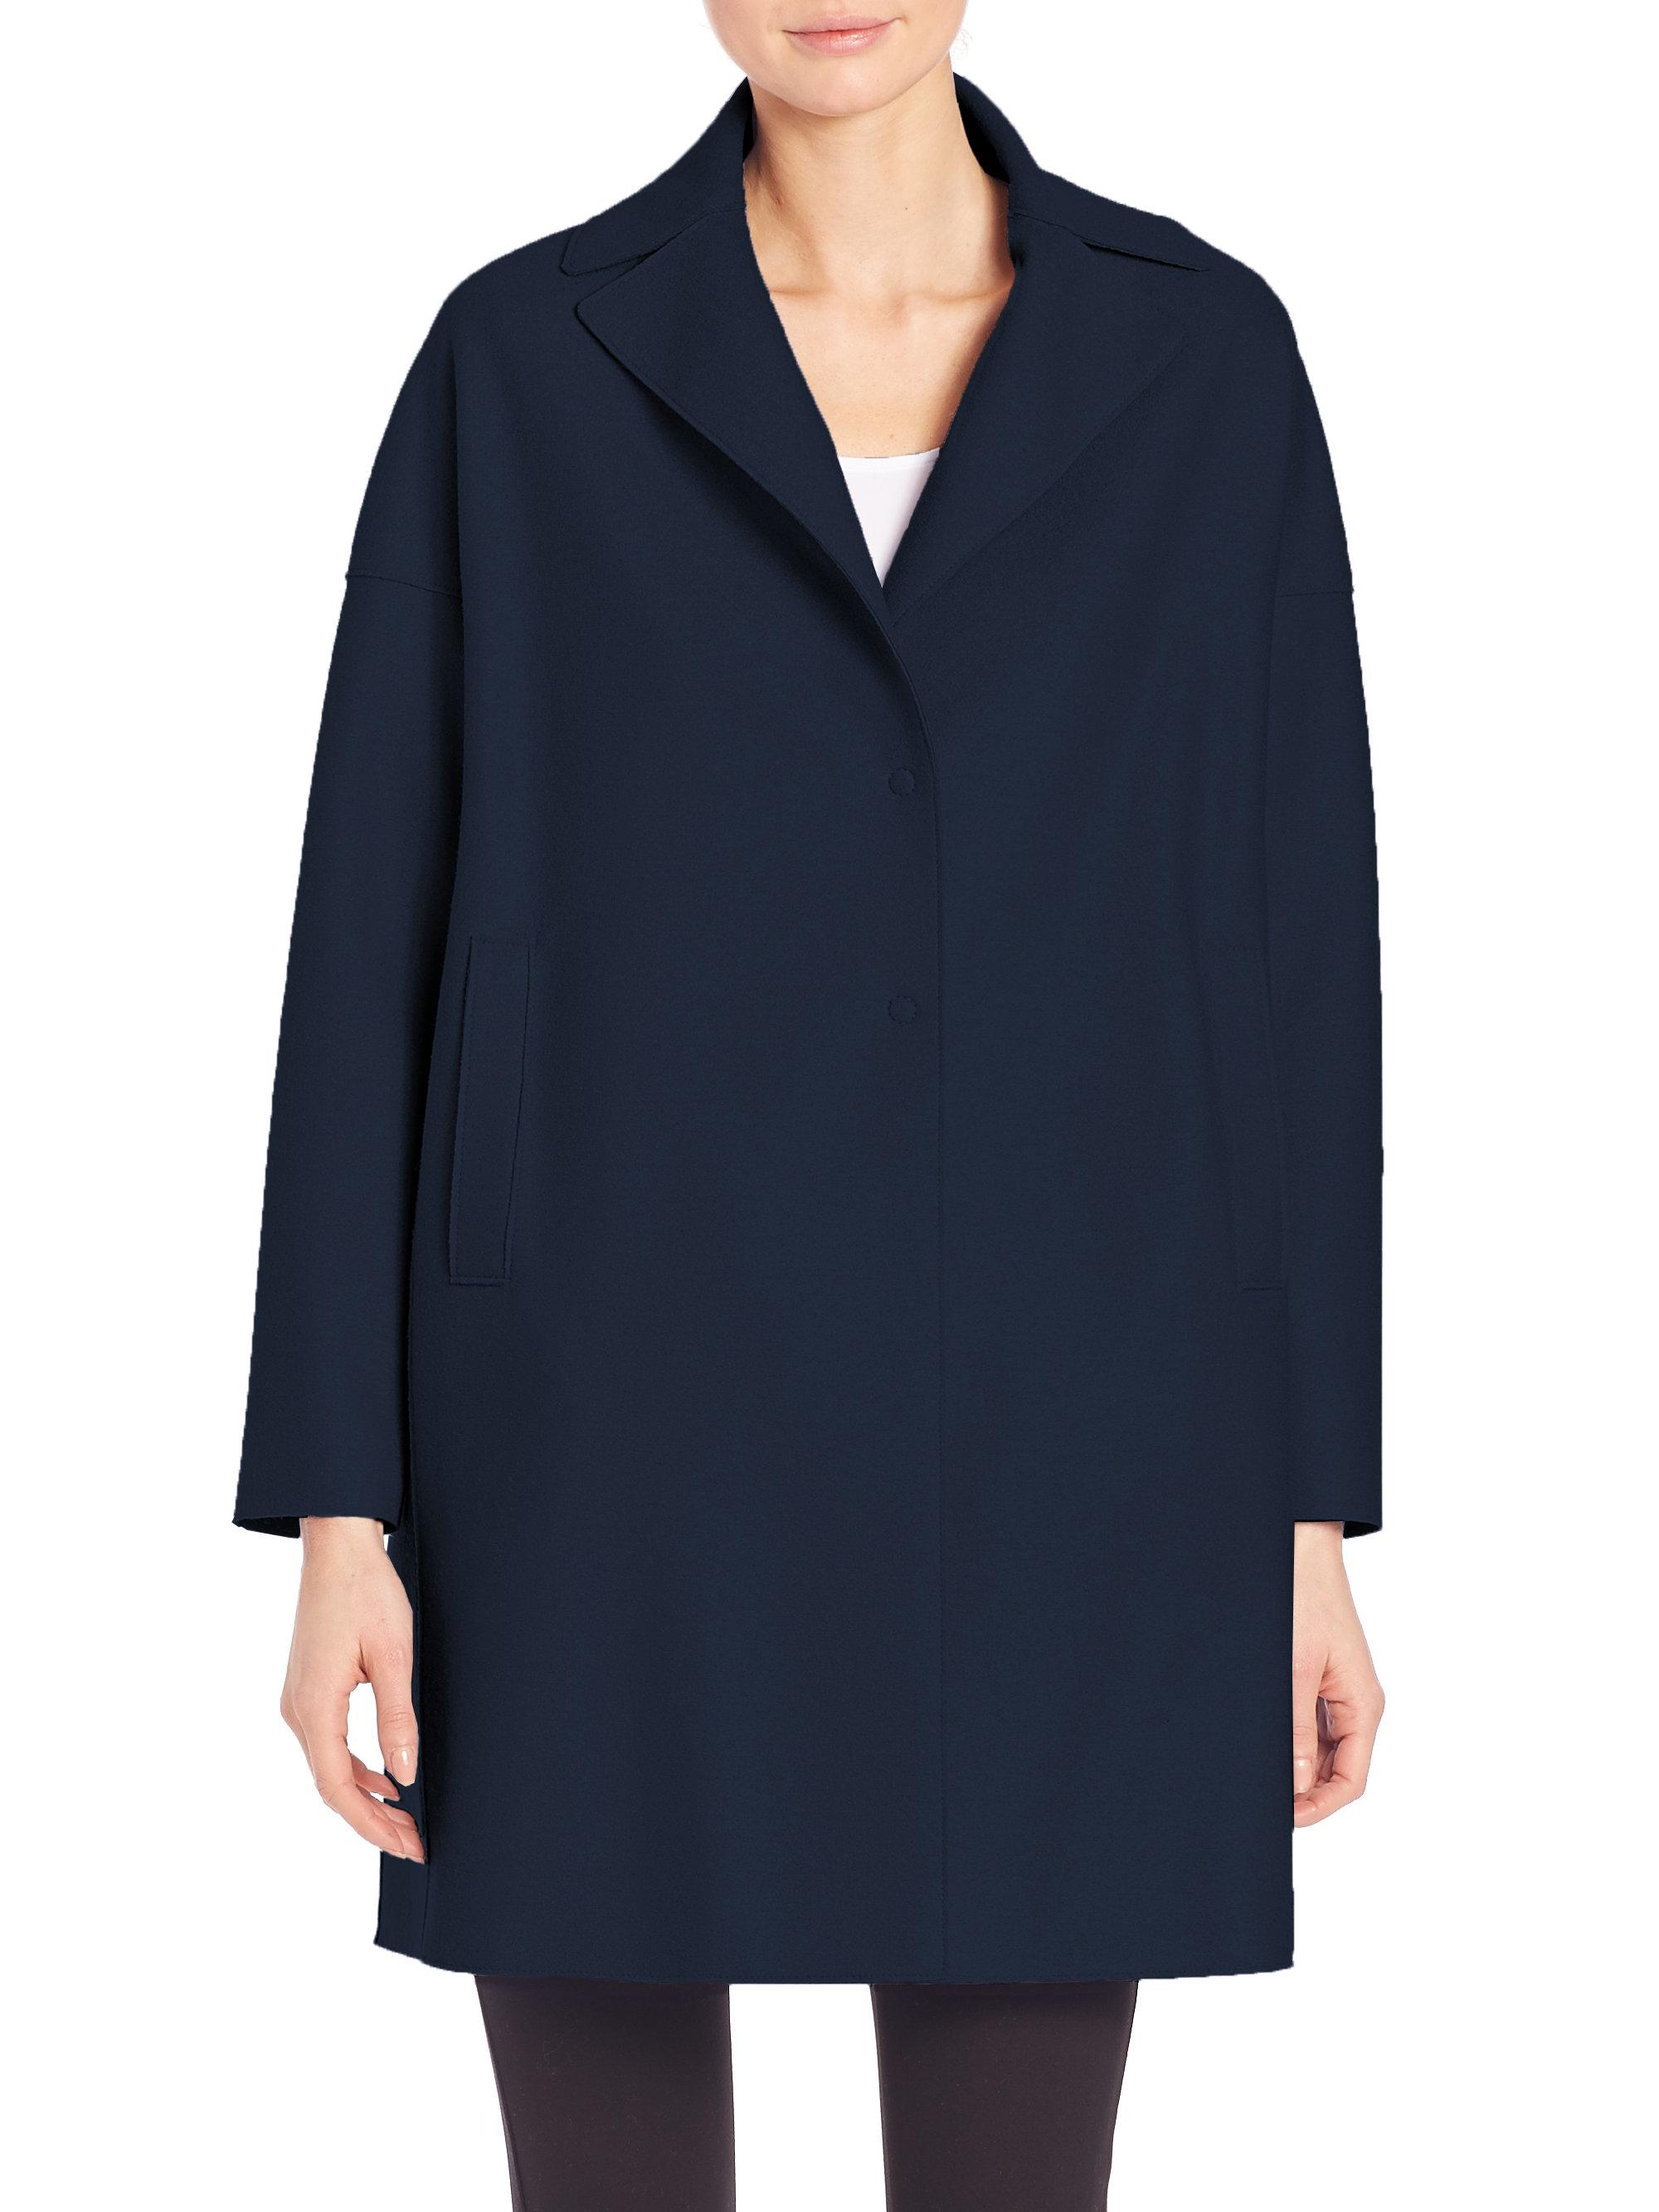 Lyst - Harris Wharf London Wool Oversized Coat in Blue 5f13e6c13871f